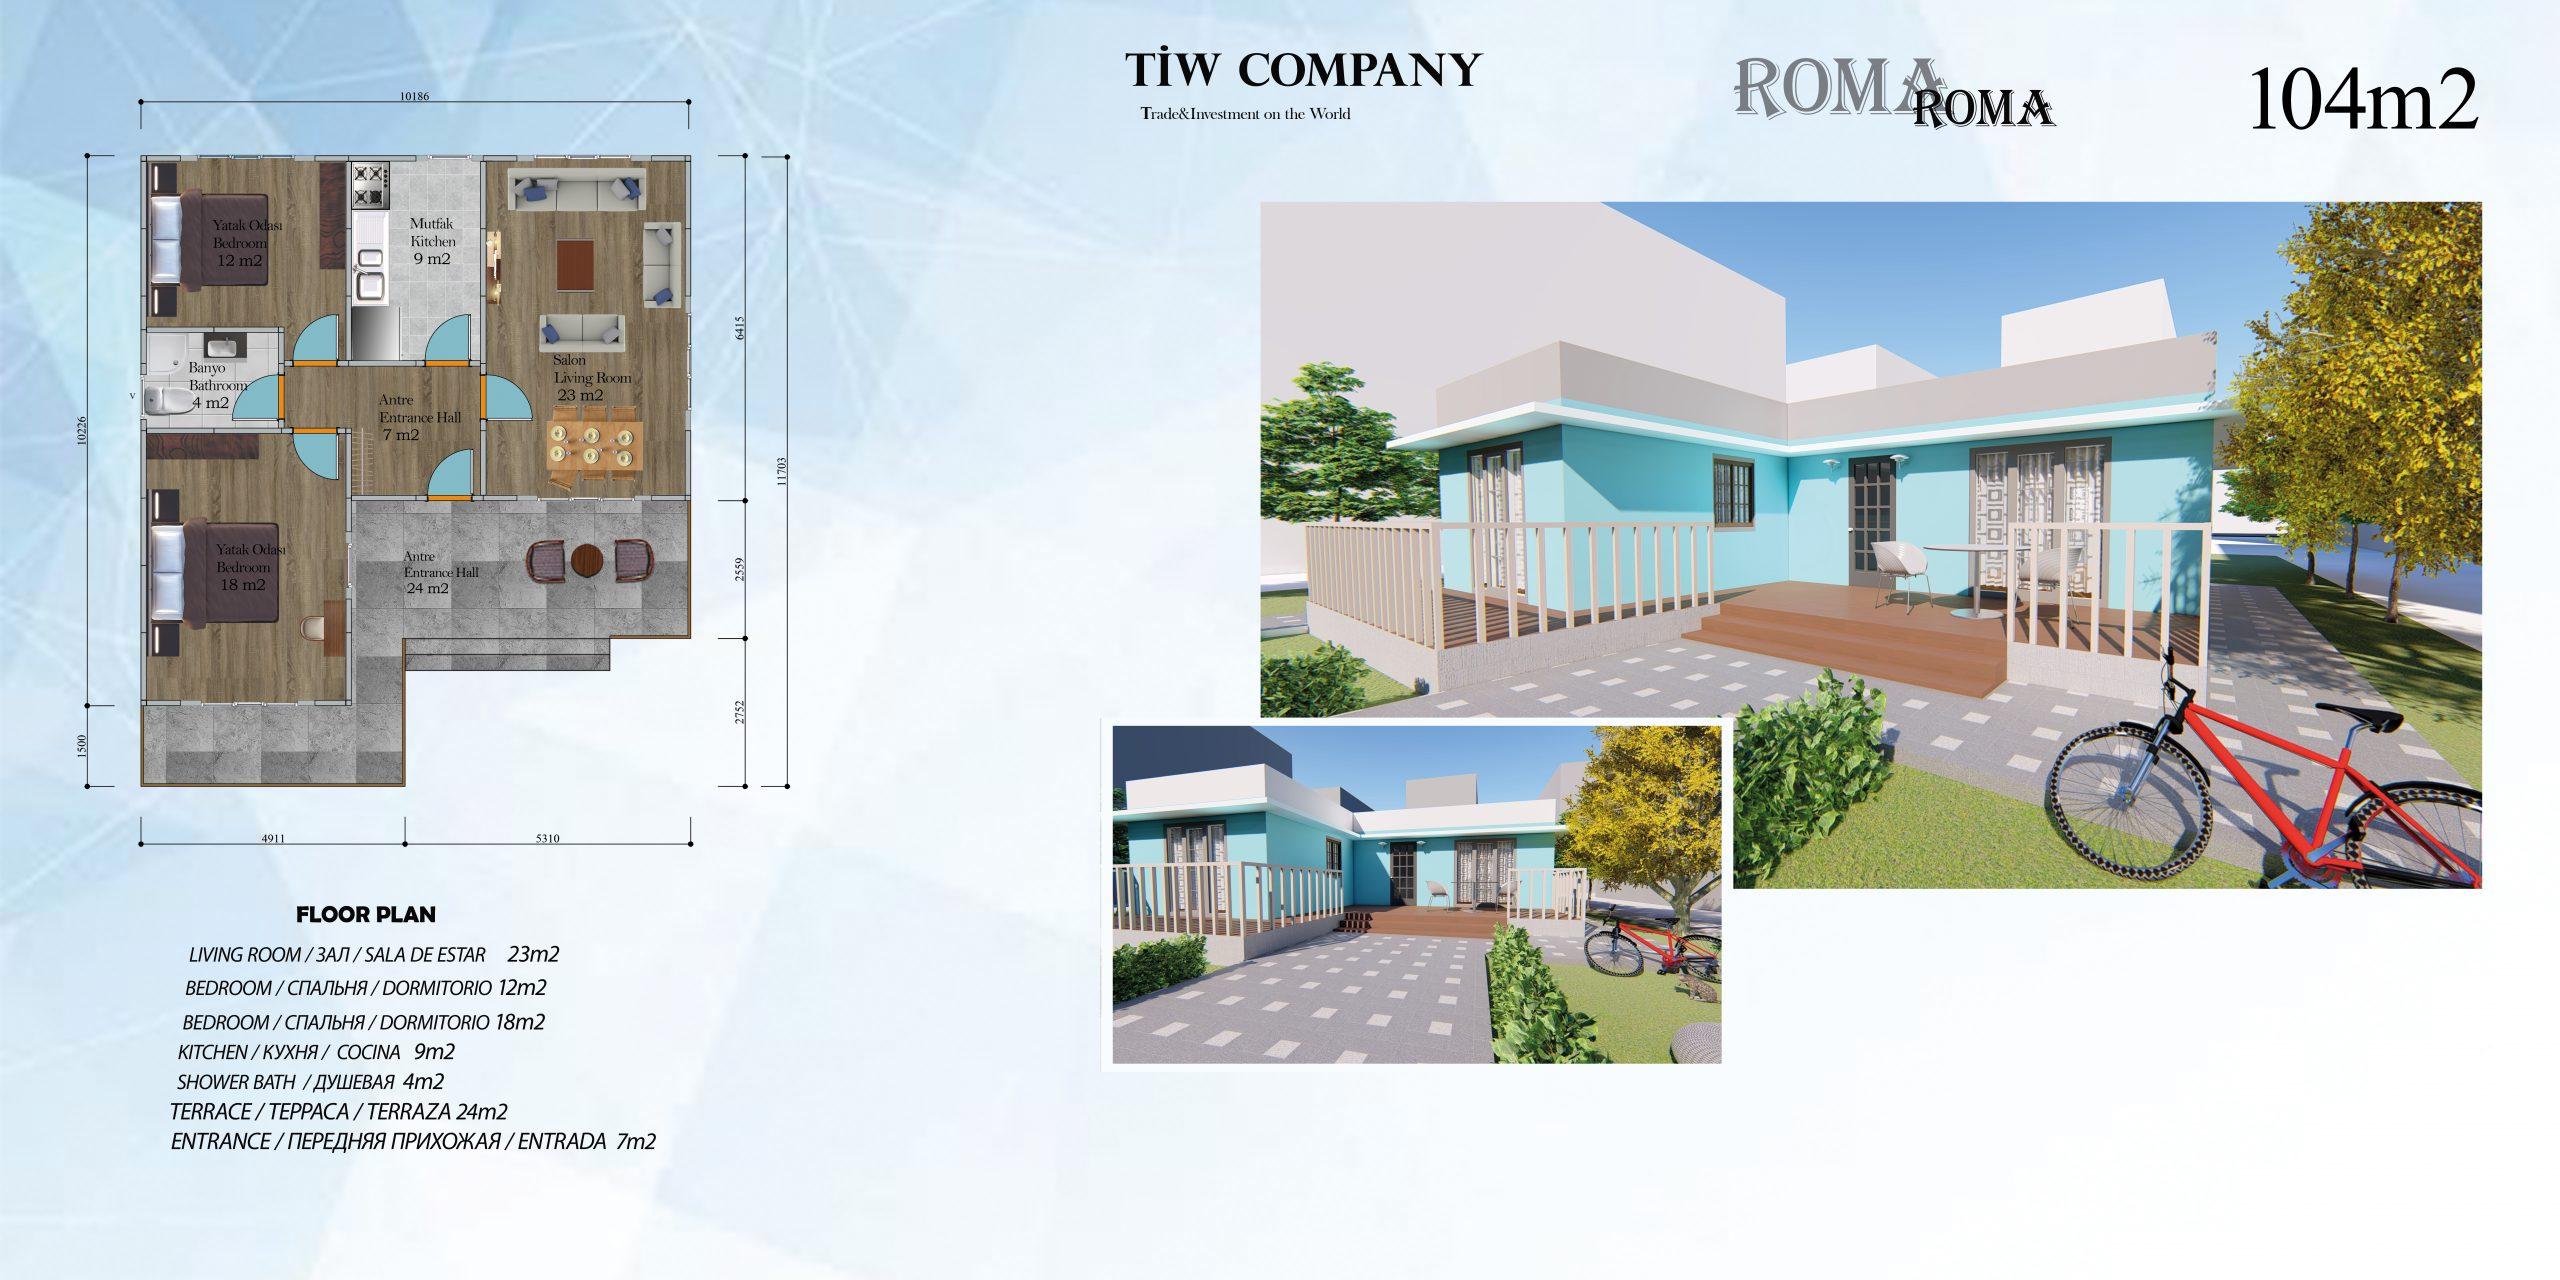 ROMA HOUSE